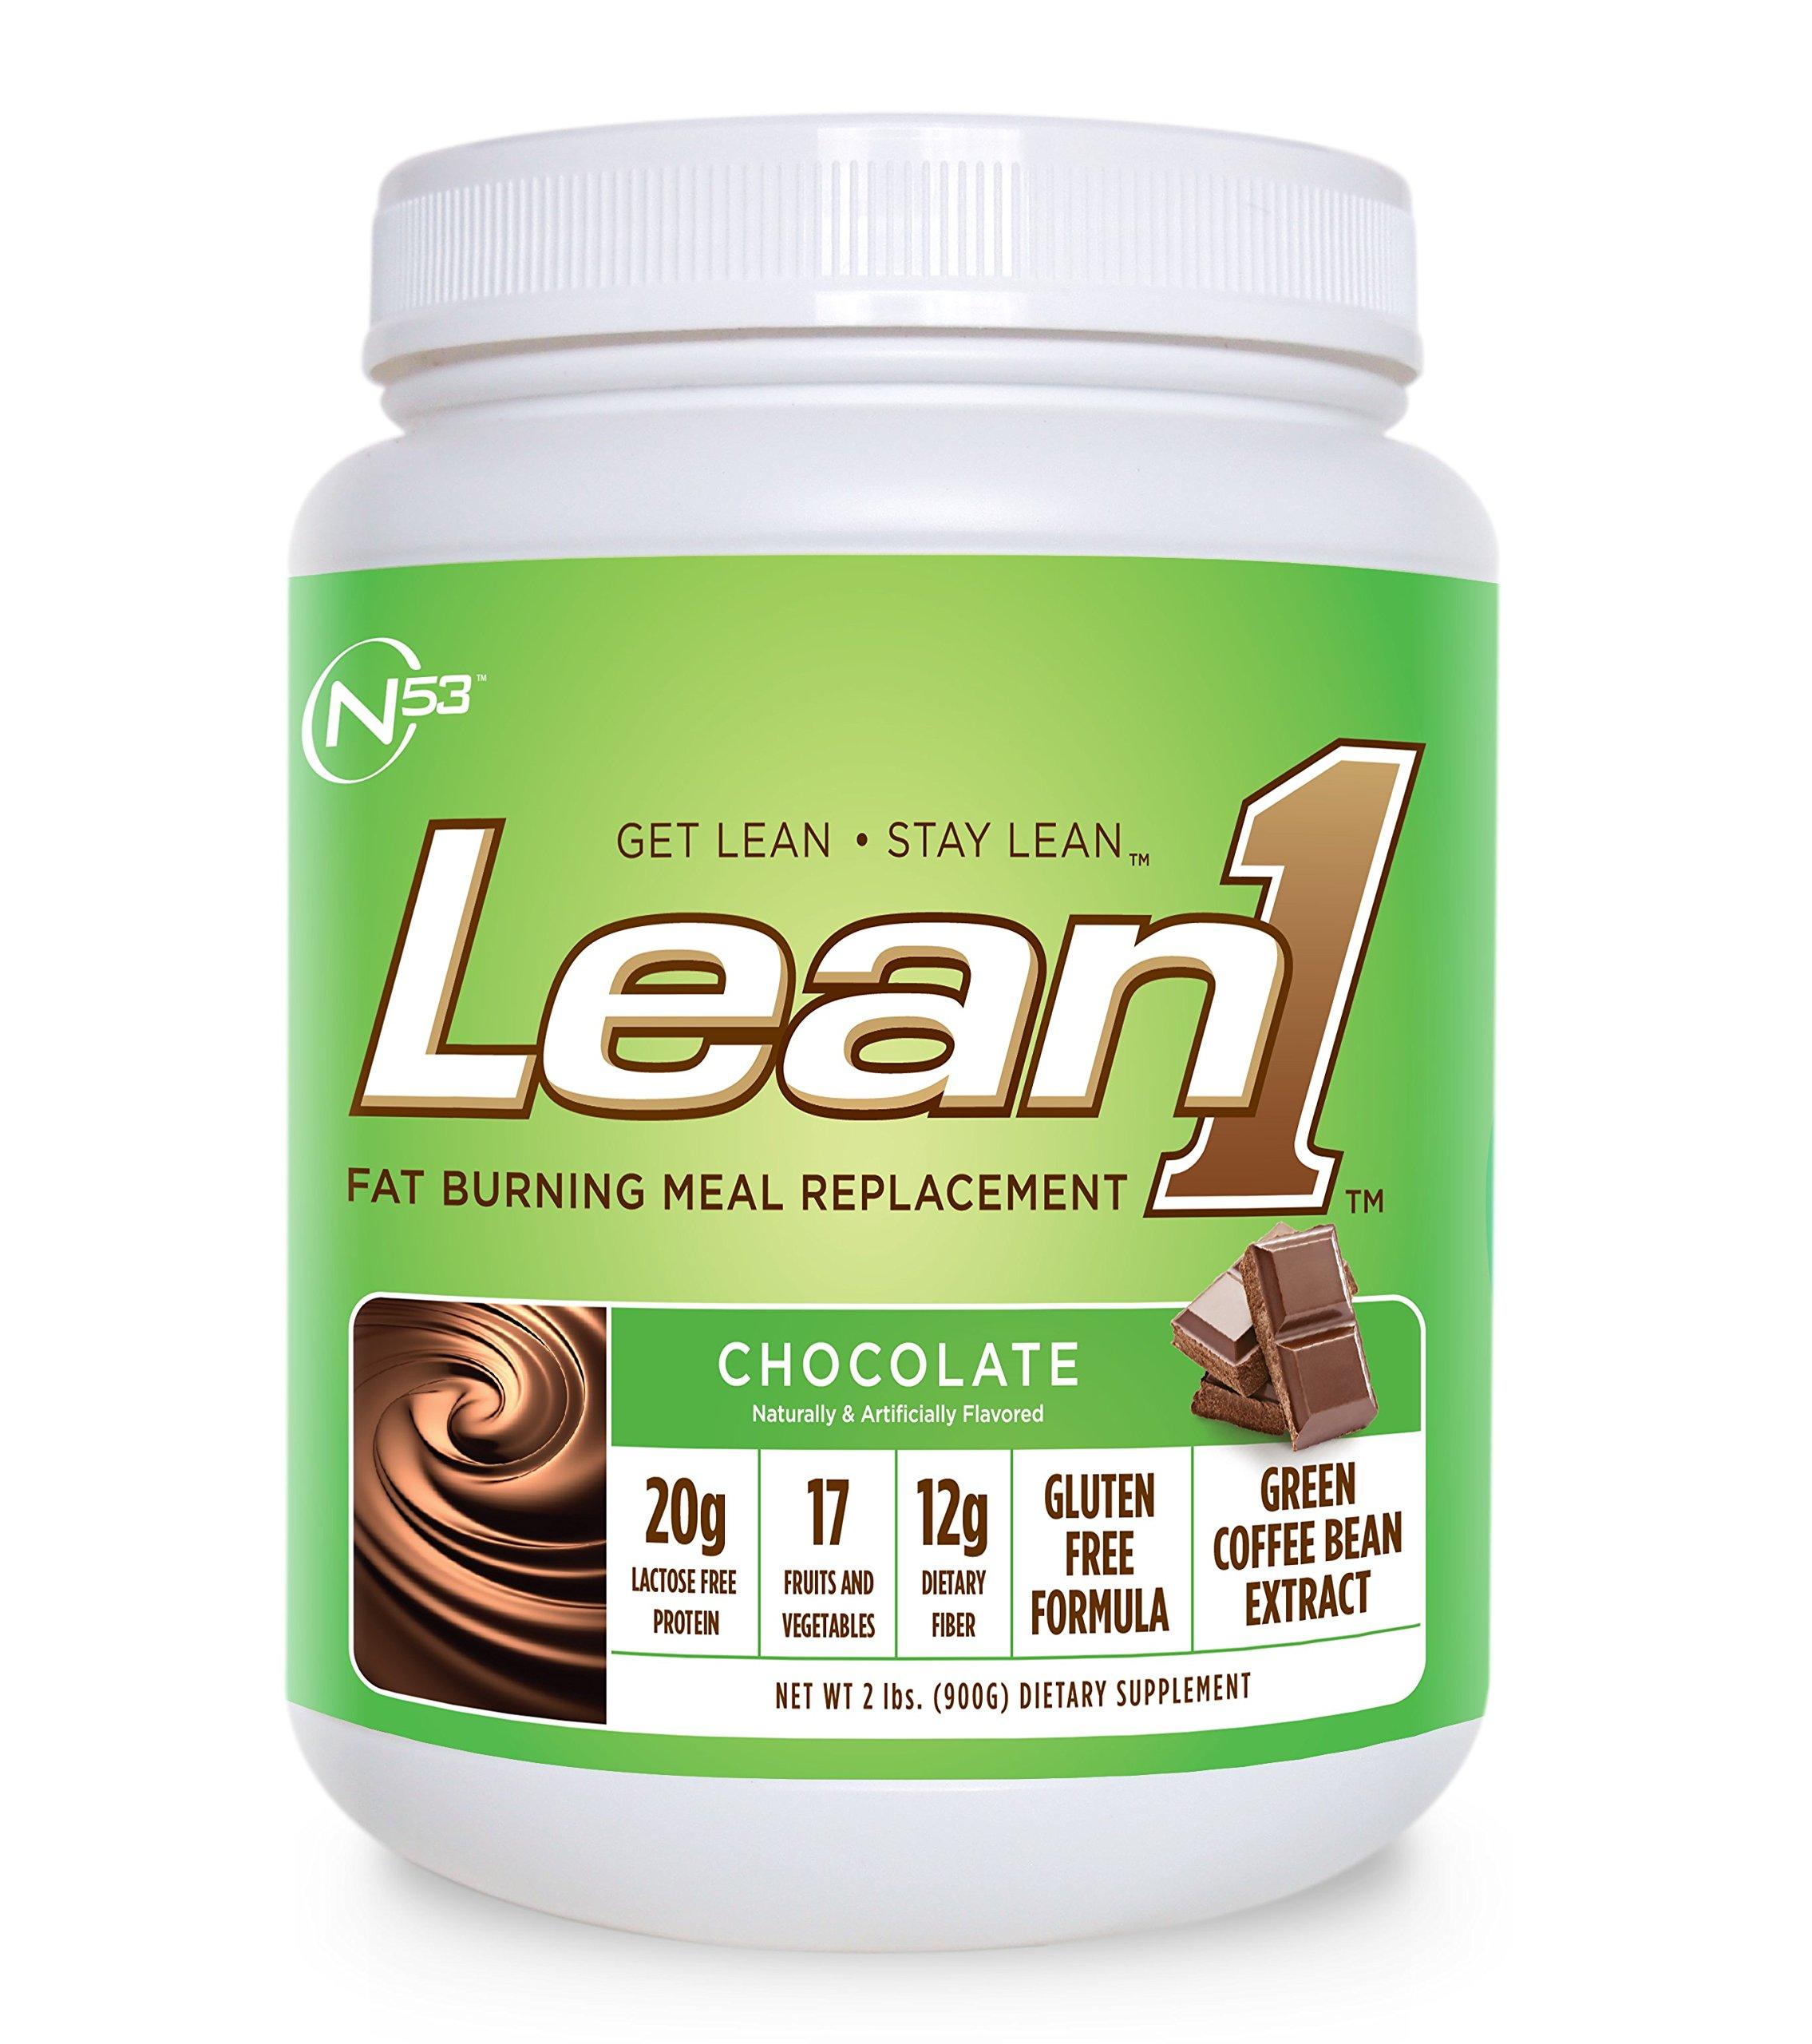 Nutrition 53 Lean1 Chocolate, 15 Serving Tub, 1.98 lbs. by Lean1